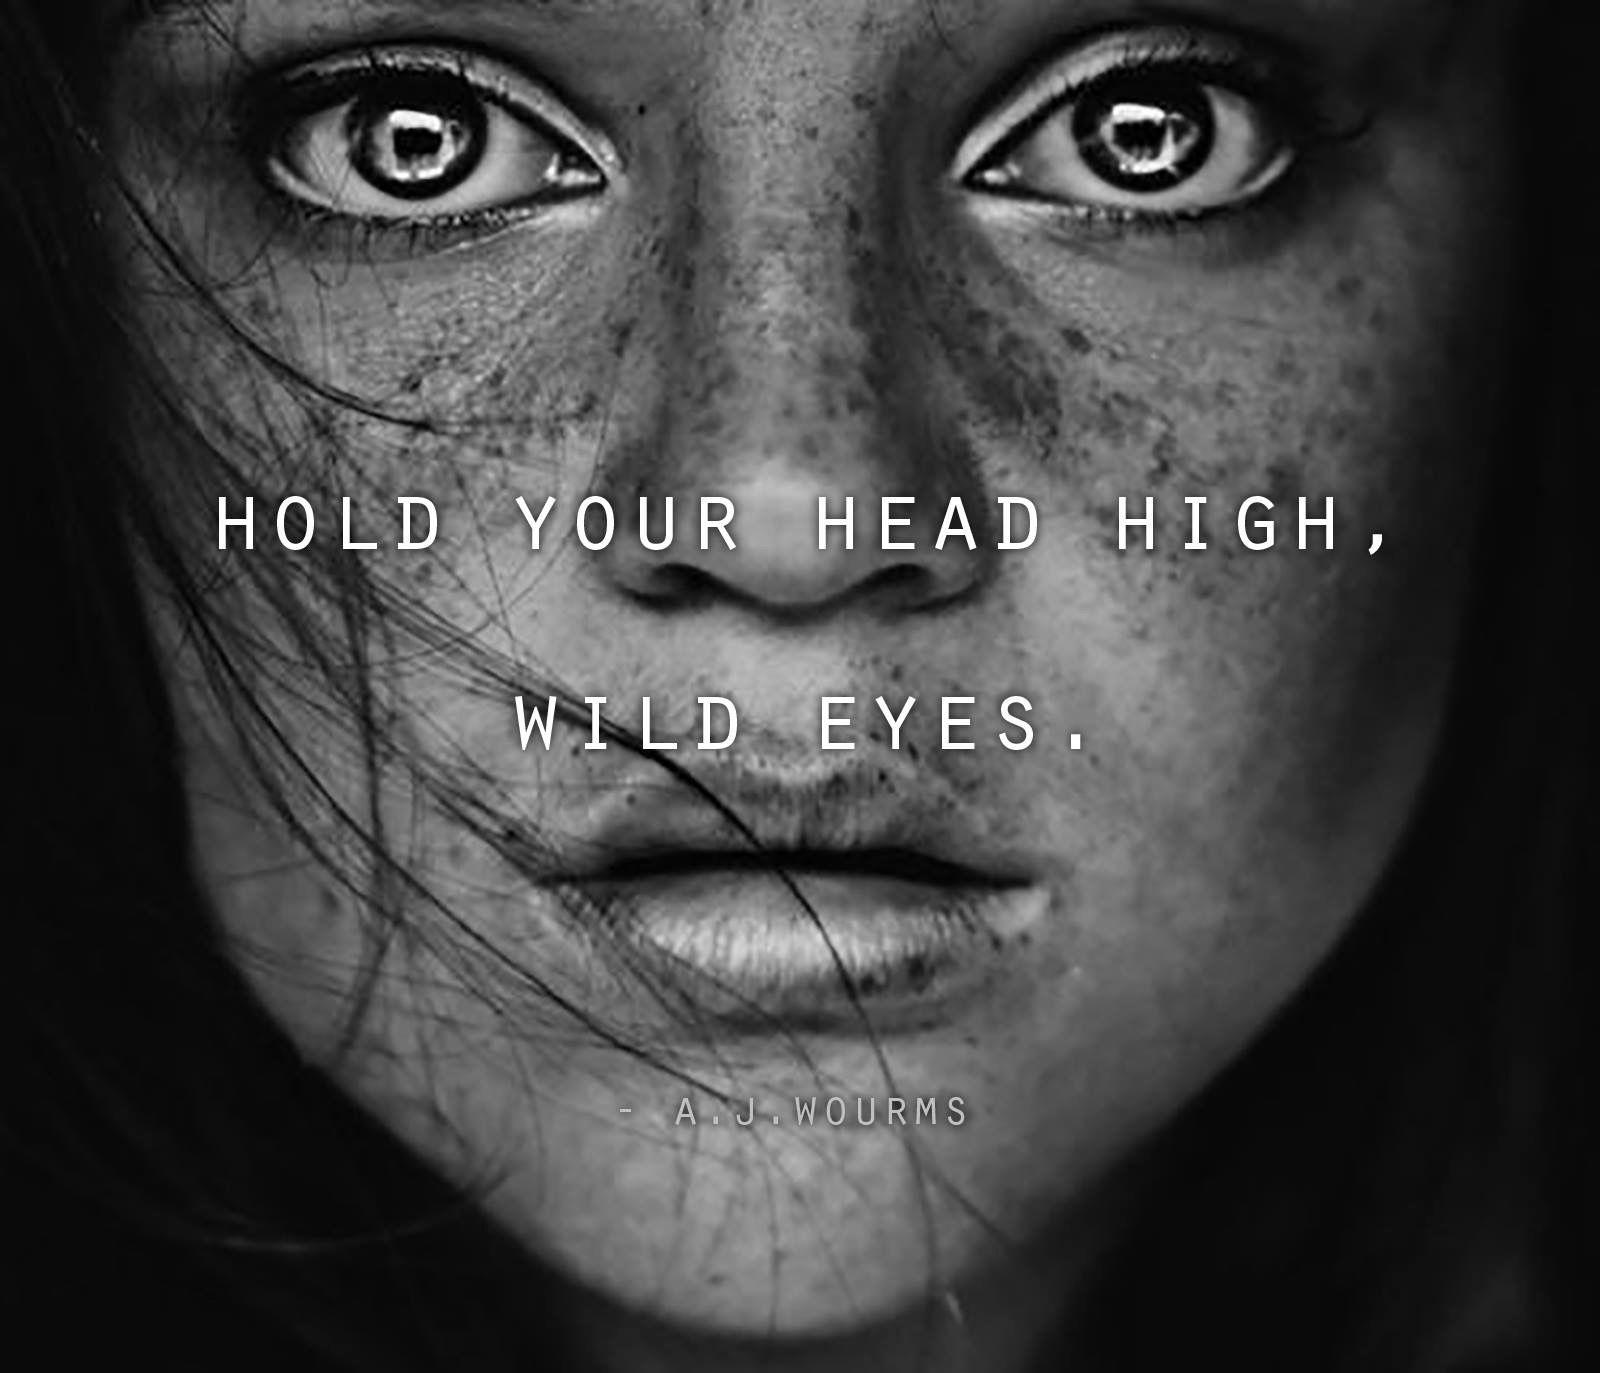 Wild eyes by a j wourms